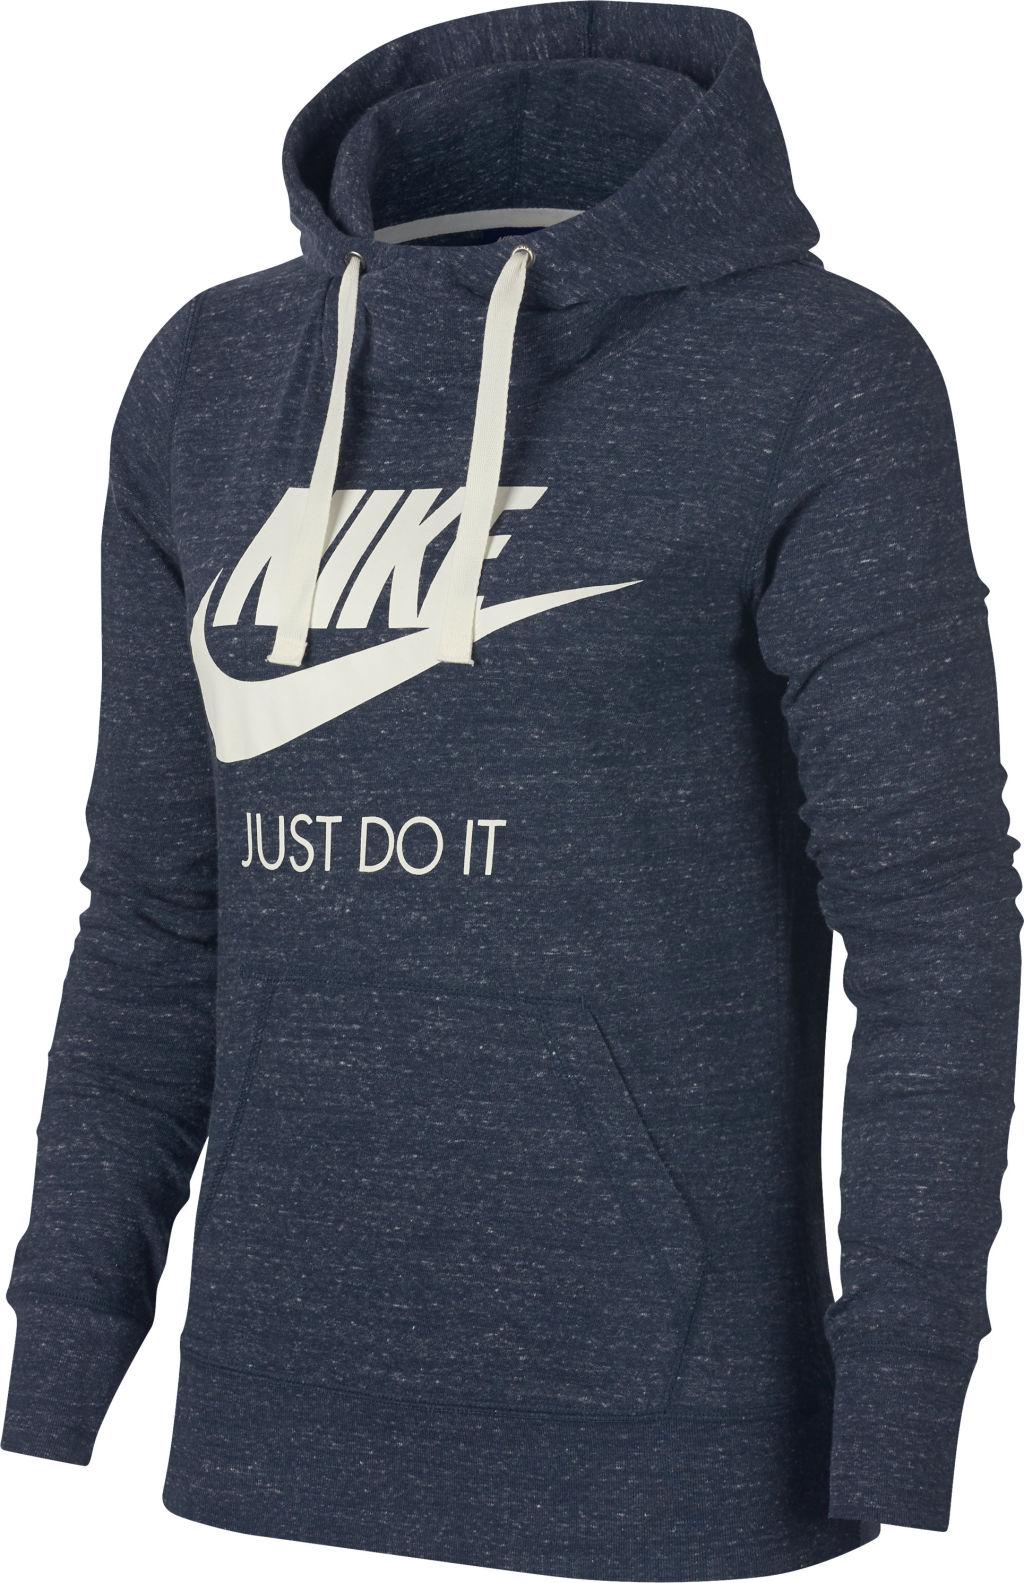 Nike Nsw Gym Vntg naisten huppari Sininen c7dcd7188f